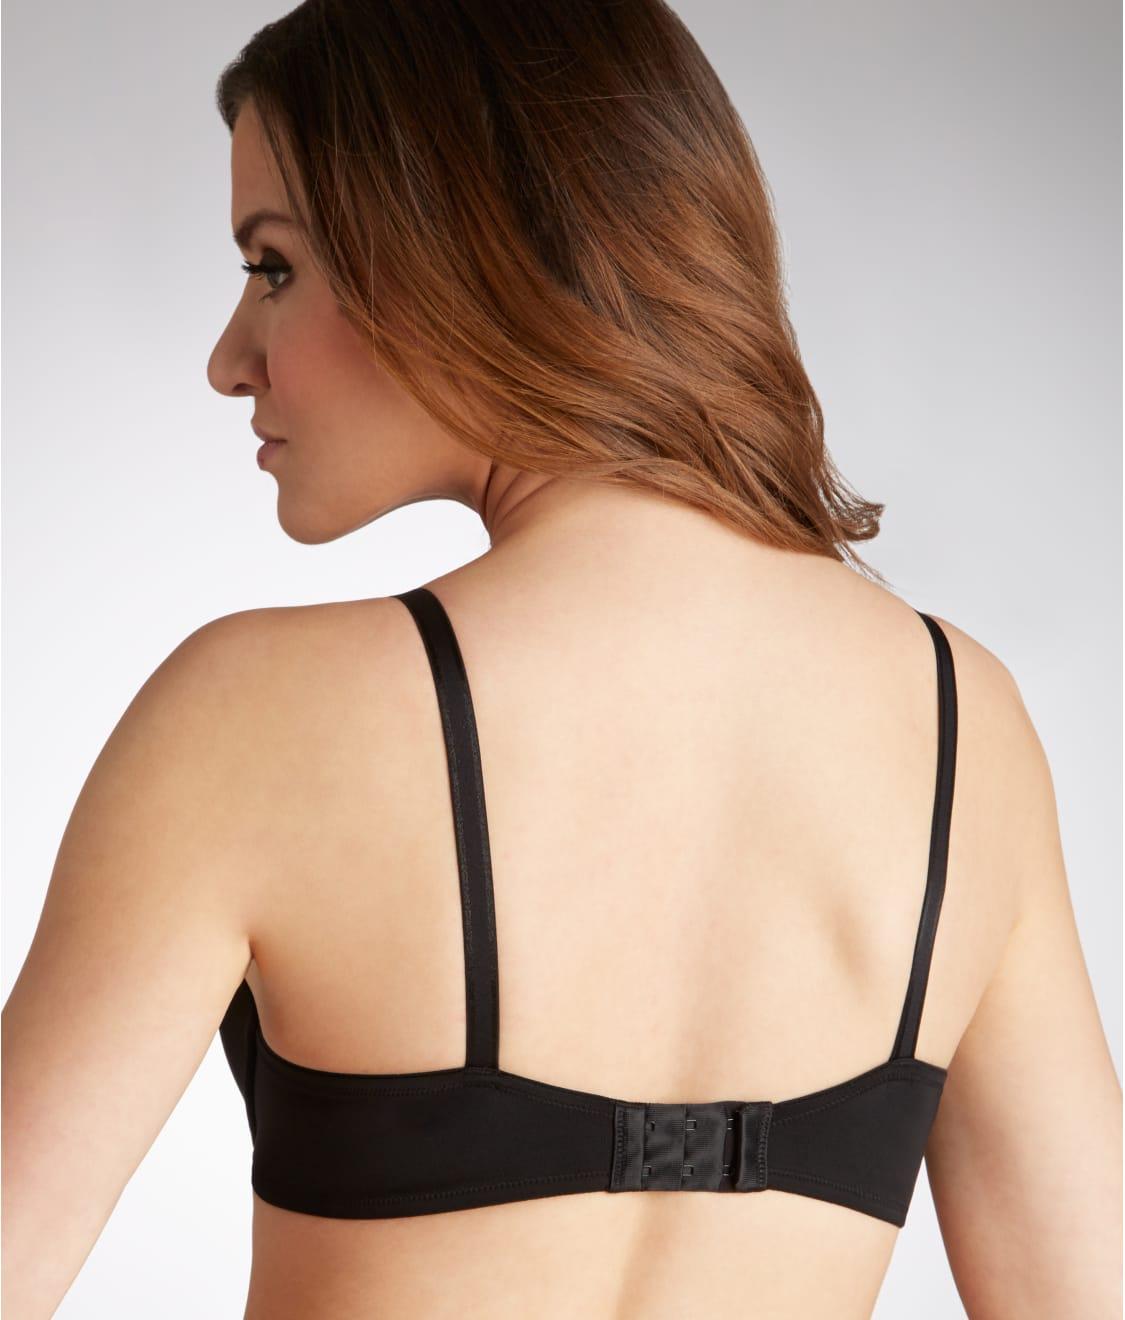 See This Is Not A Bra® T-Shirt Bra in Black. Warner s  ... 96cdf0ee4